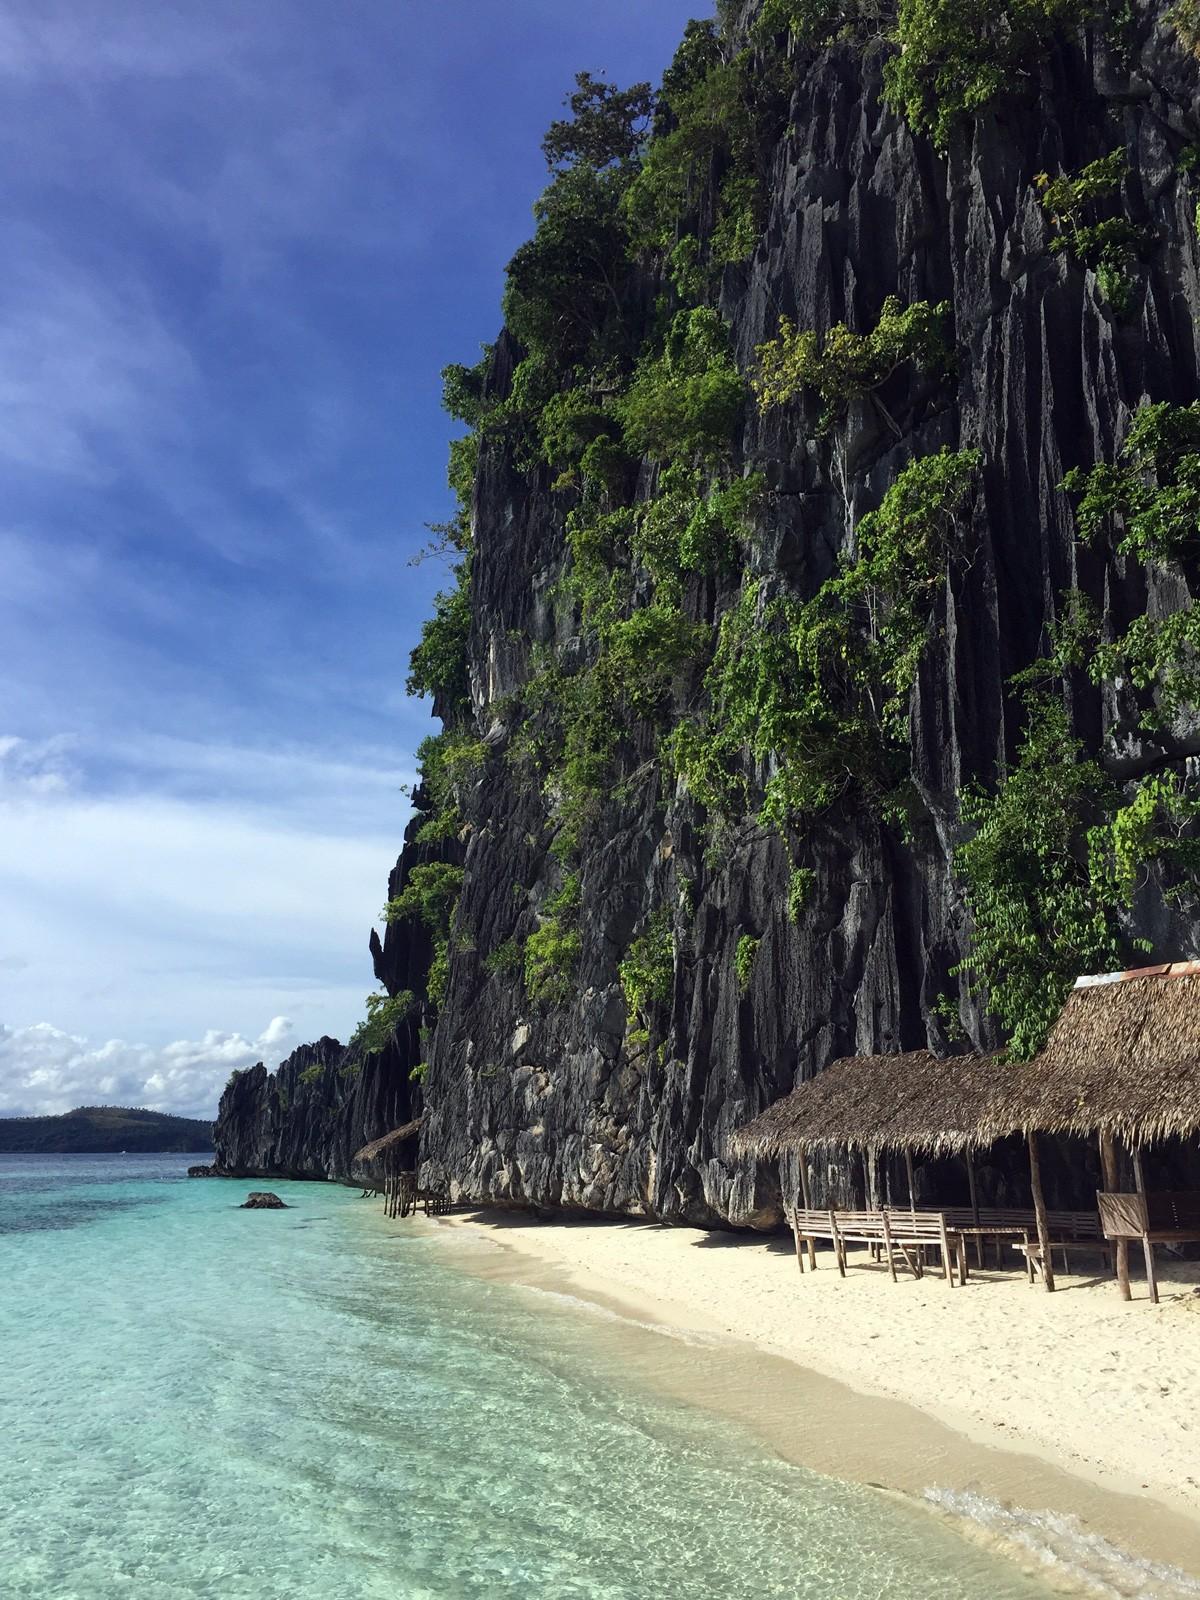 Perfect place - Banul beach, Coron, Palawan